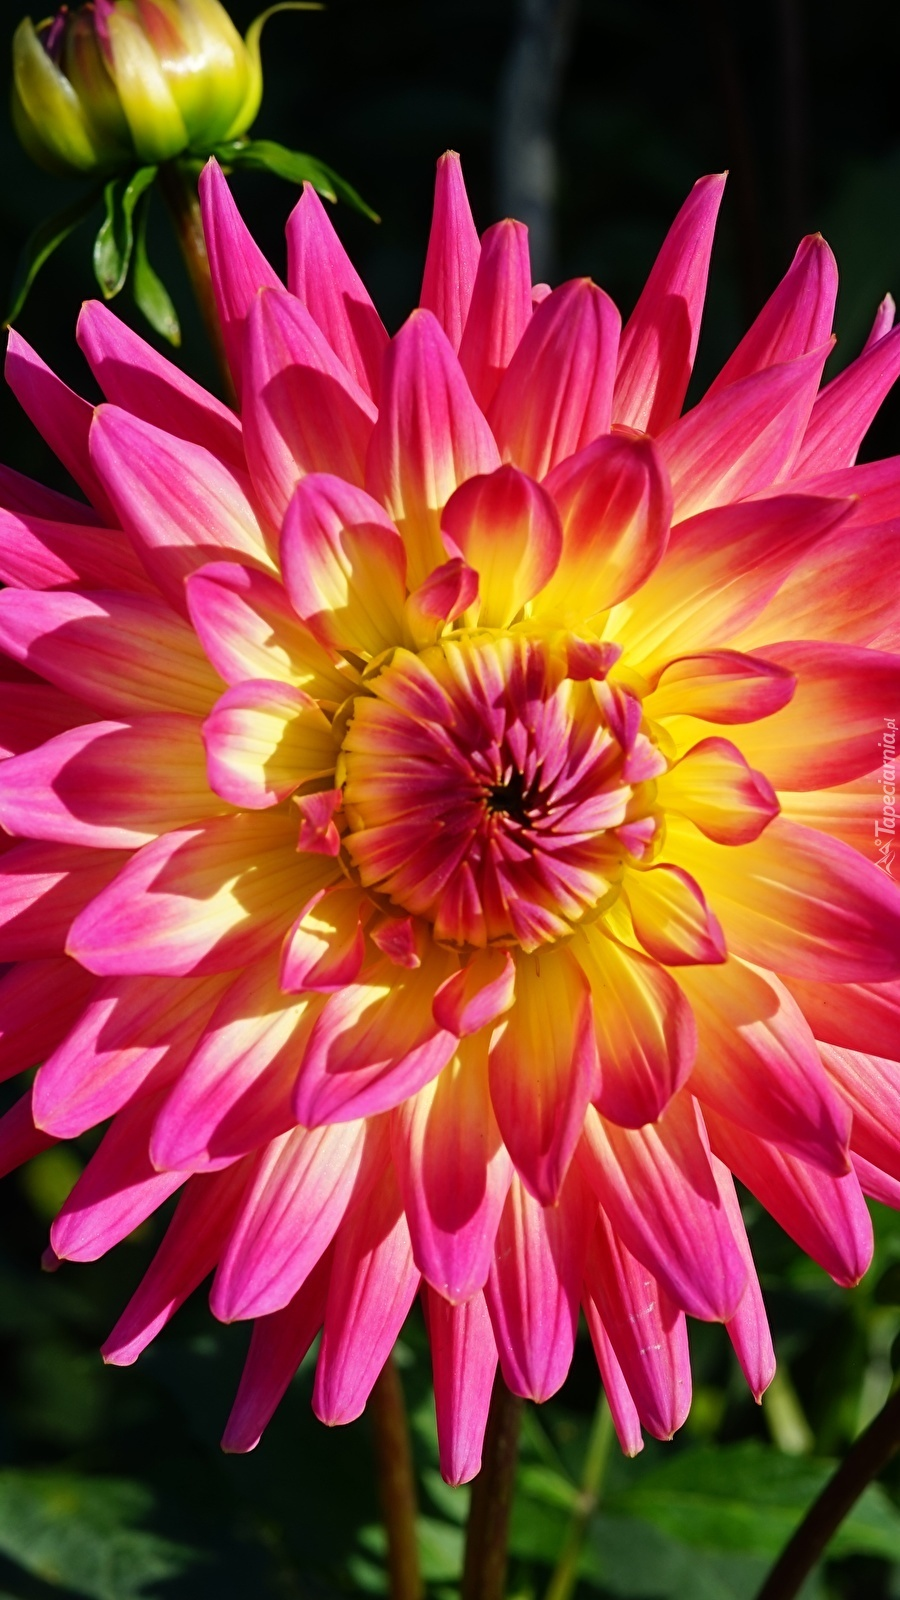 Kwiat dalii